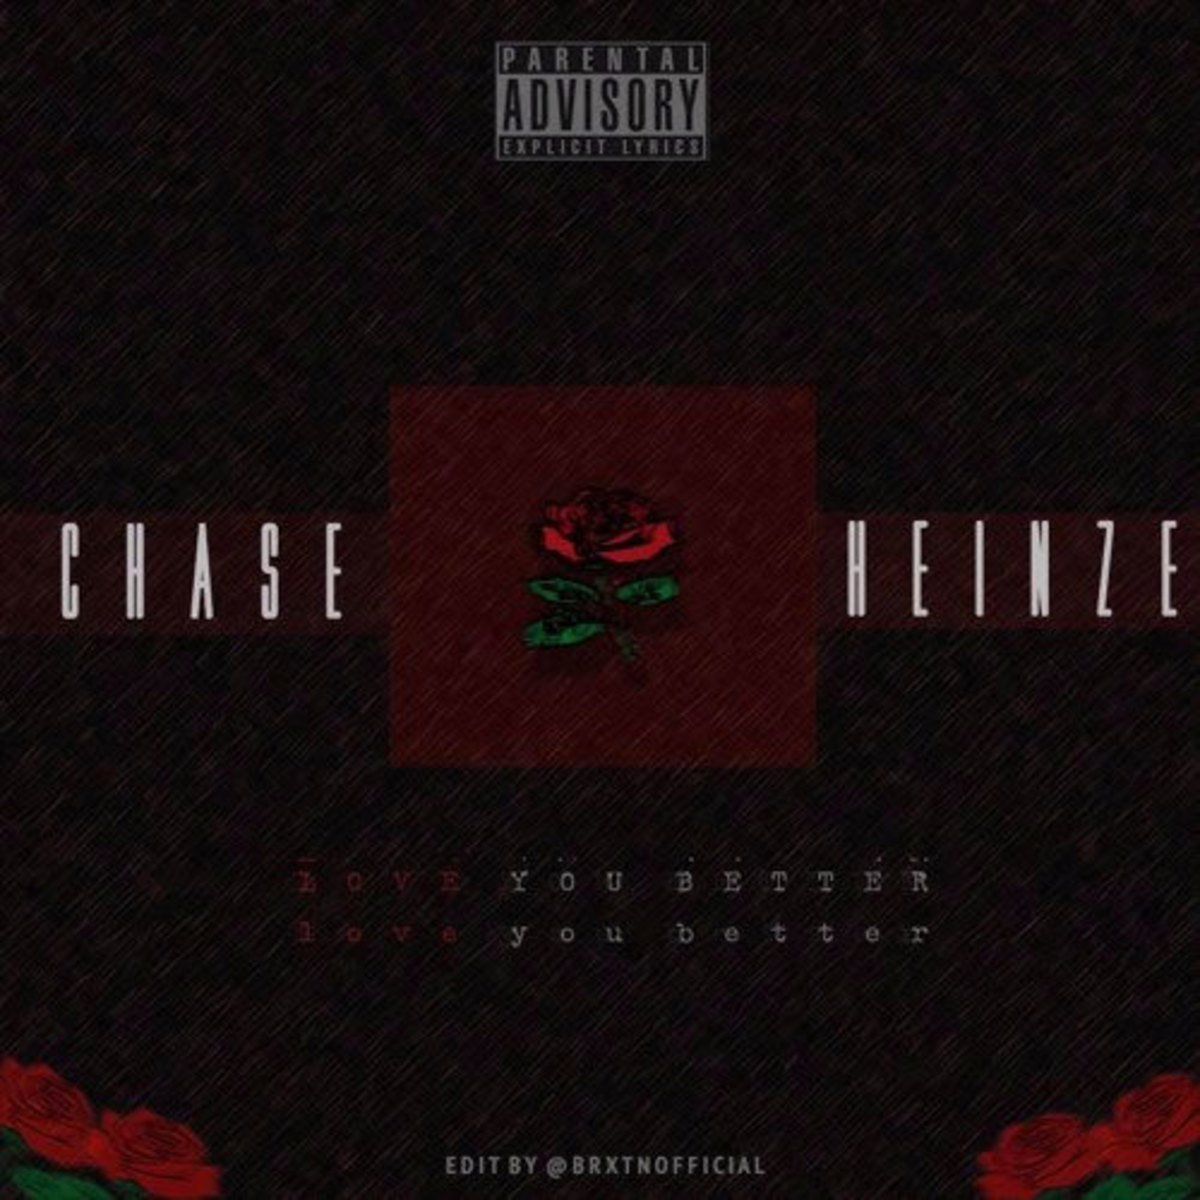 chase-heinze-love-you-better.jpg